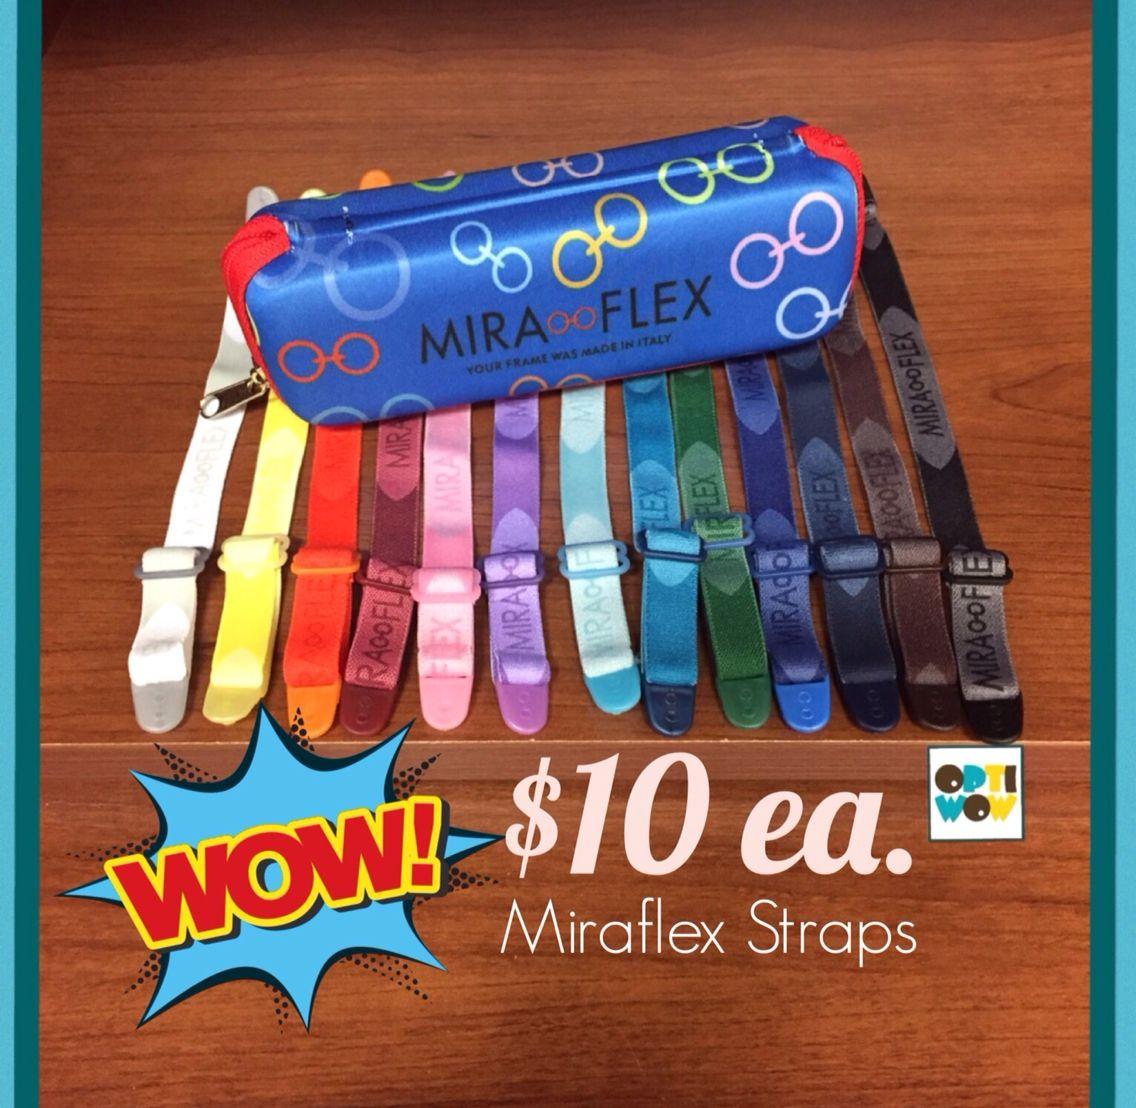 Original Miraflex Straps! All Colors Available!www.optiwow.com ...